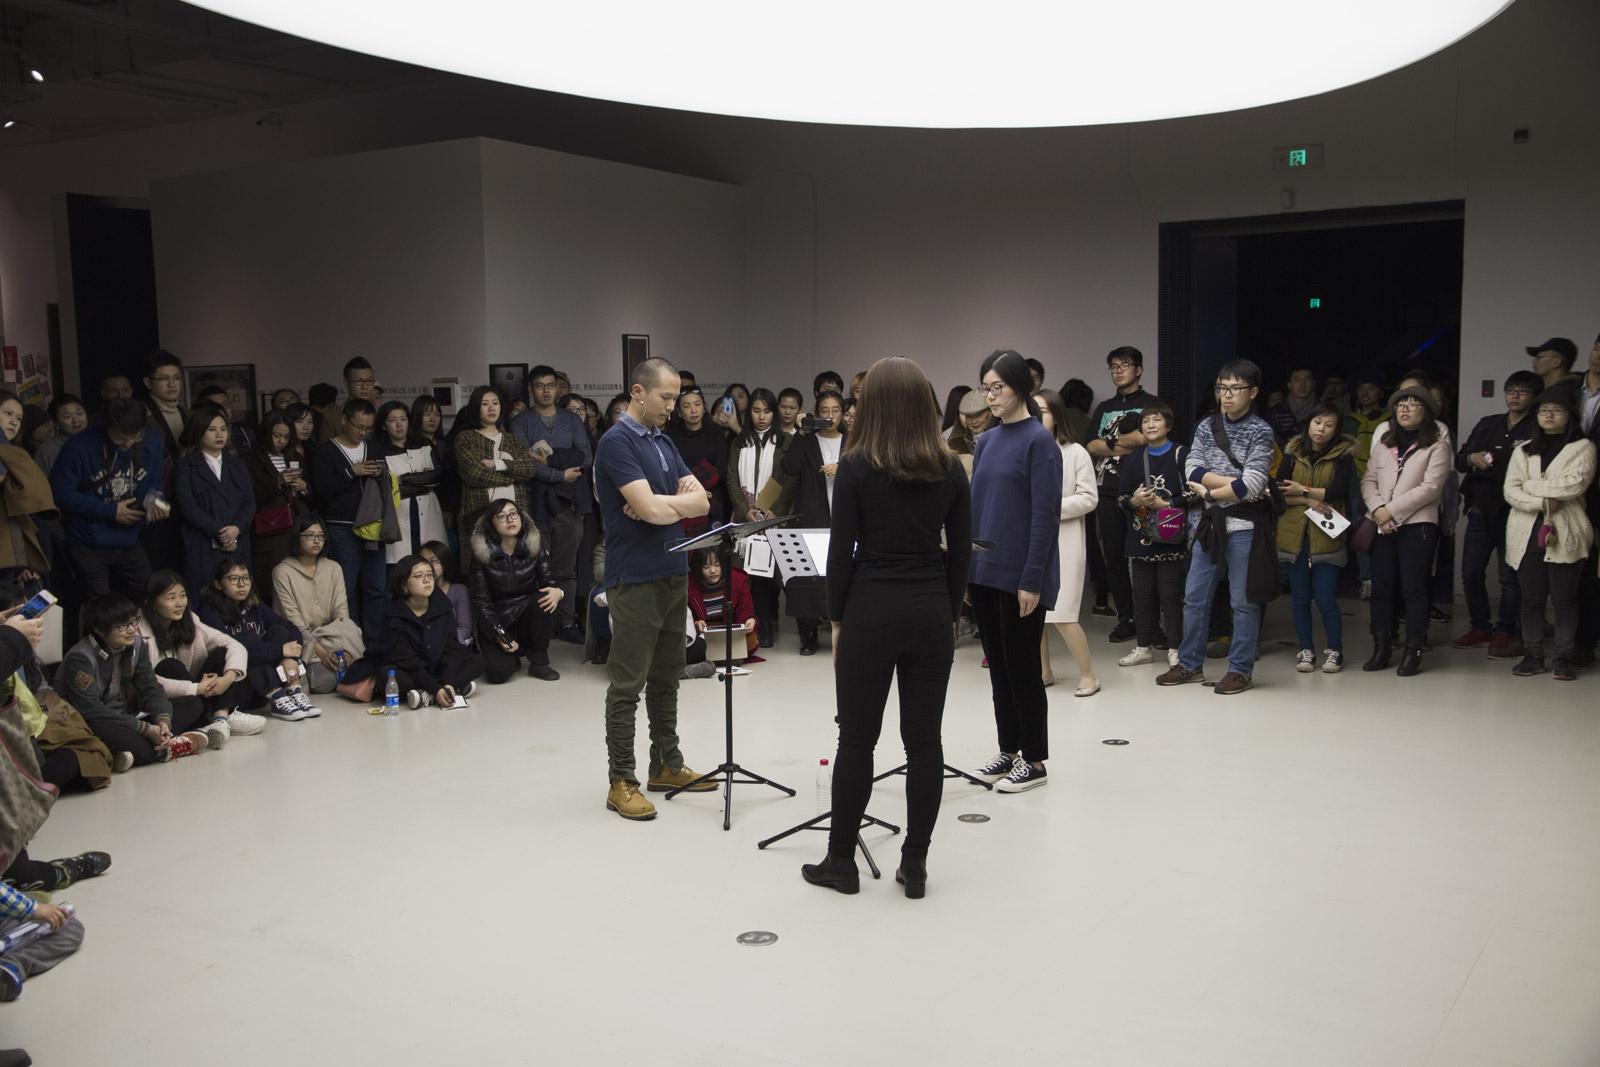 Baltensperger + Siepert - Inivisible Philosophy - Shanghai Biennale 2016